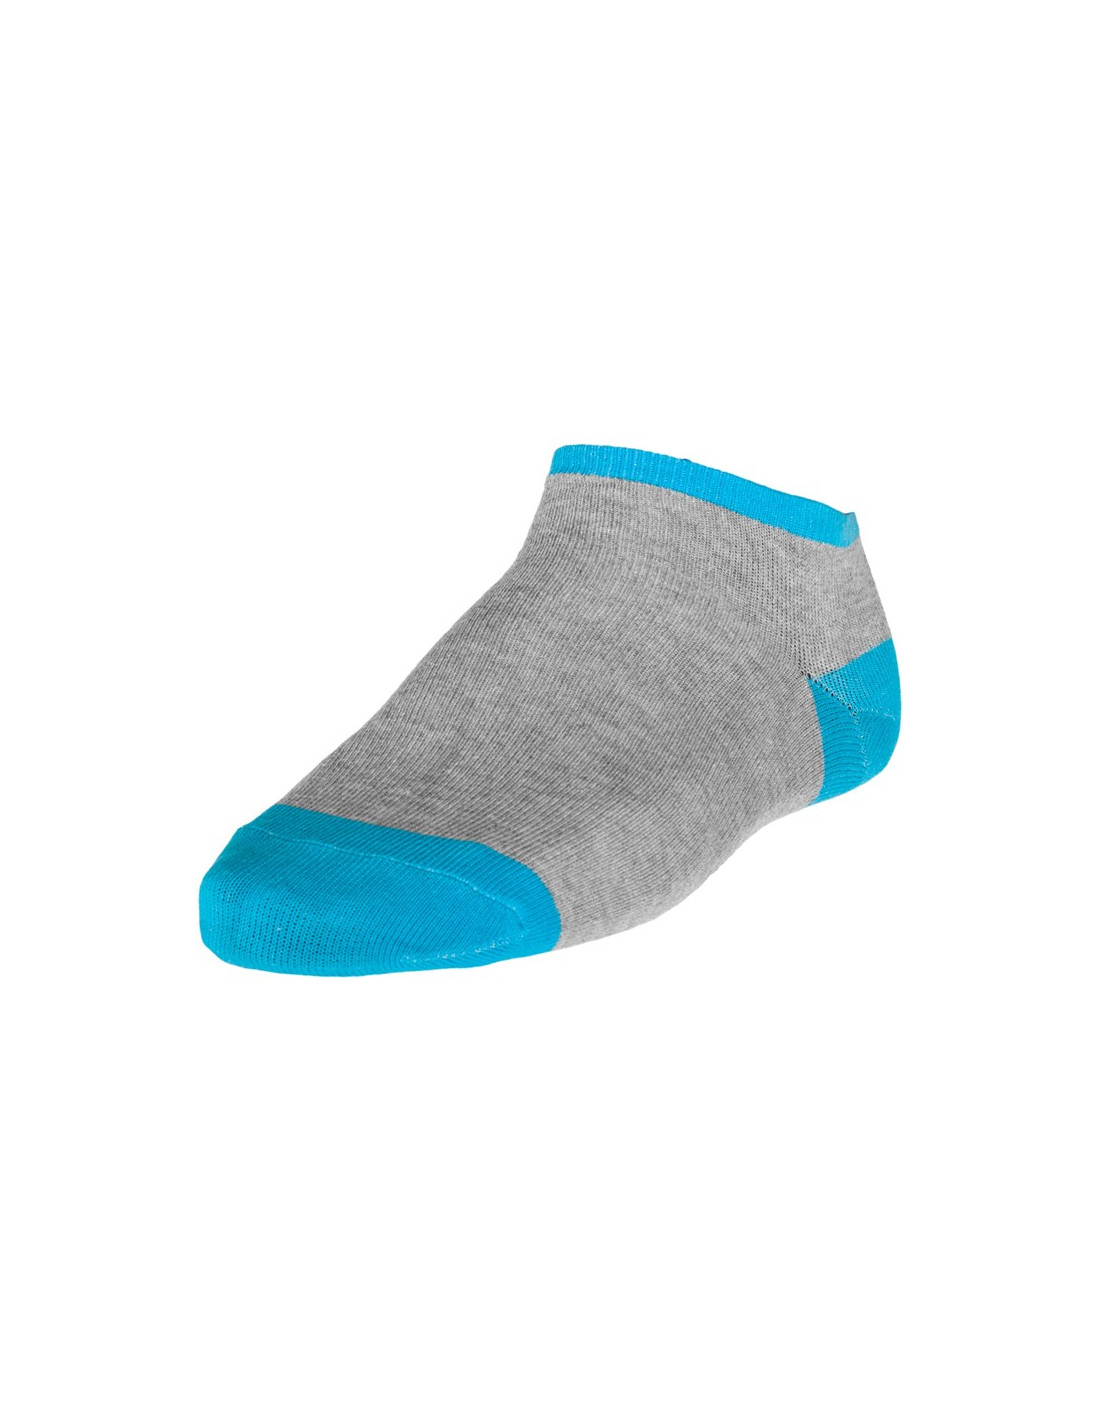 Contrast Sneaker Socks Grey Turquis